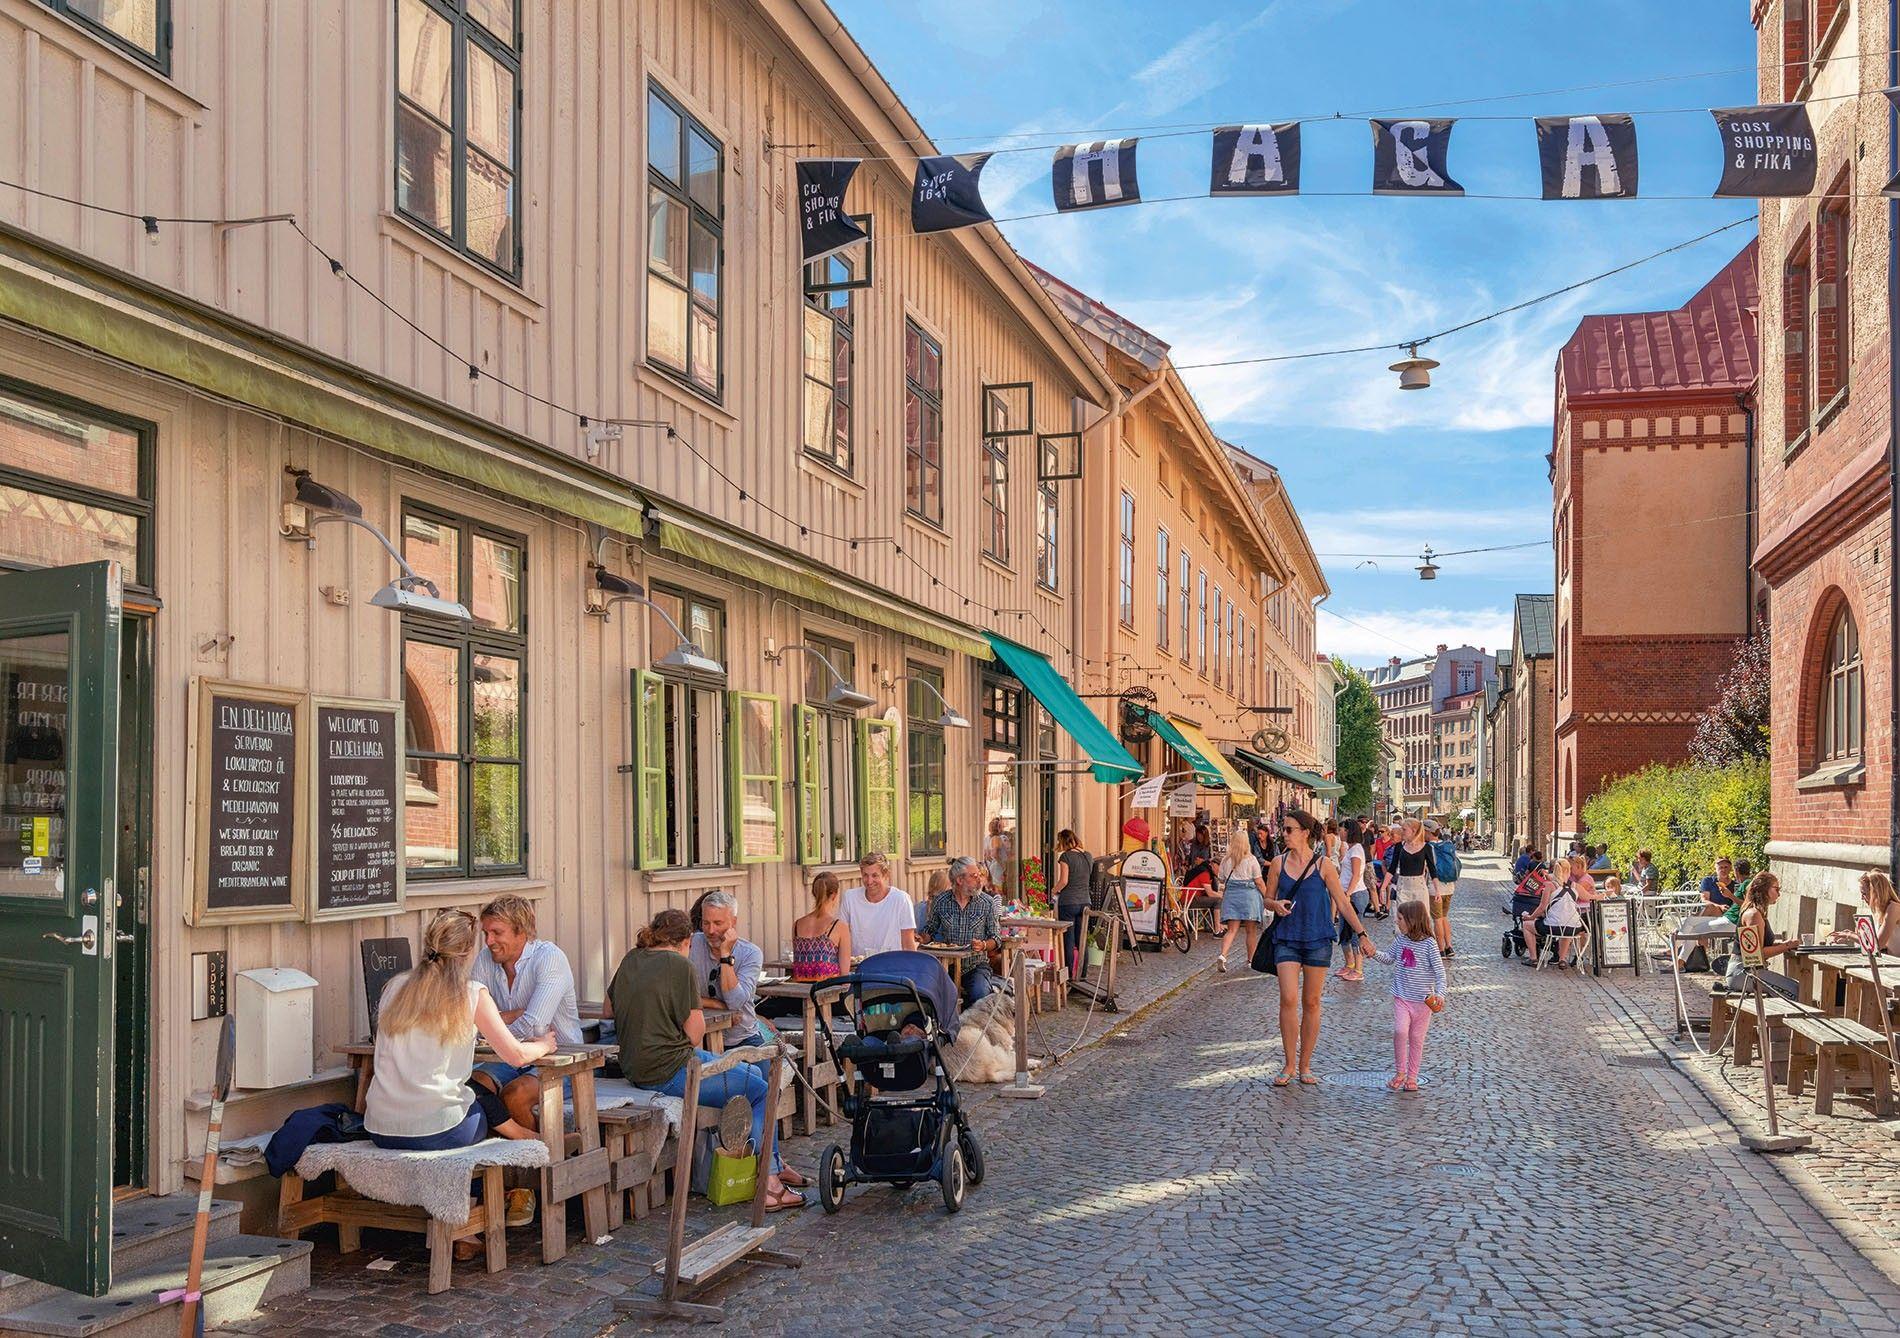 Haga Nygata in the Haga district, Gothenburg